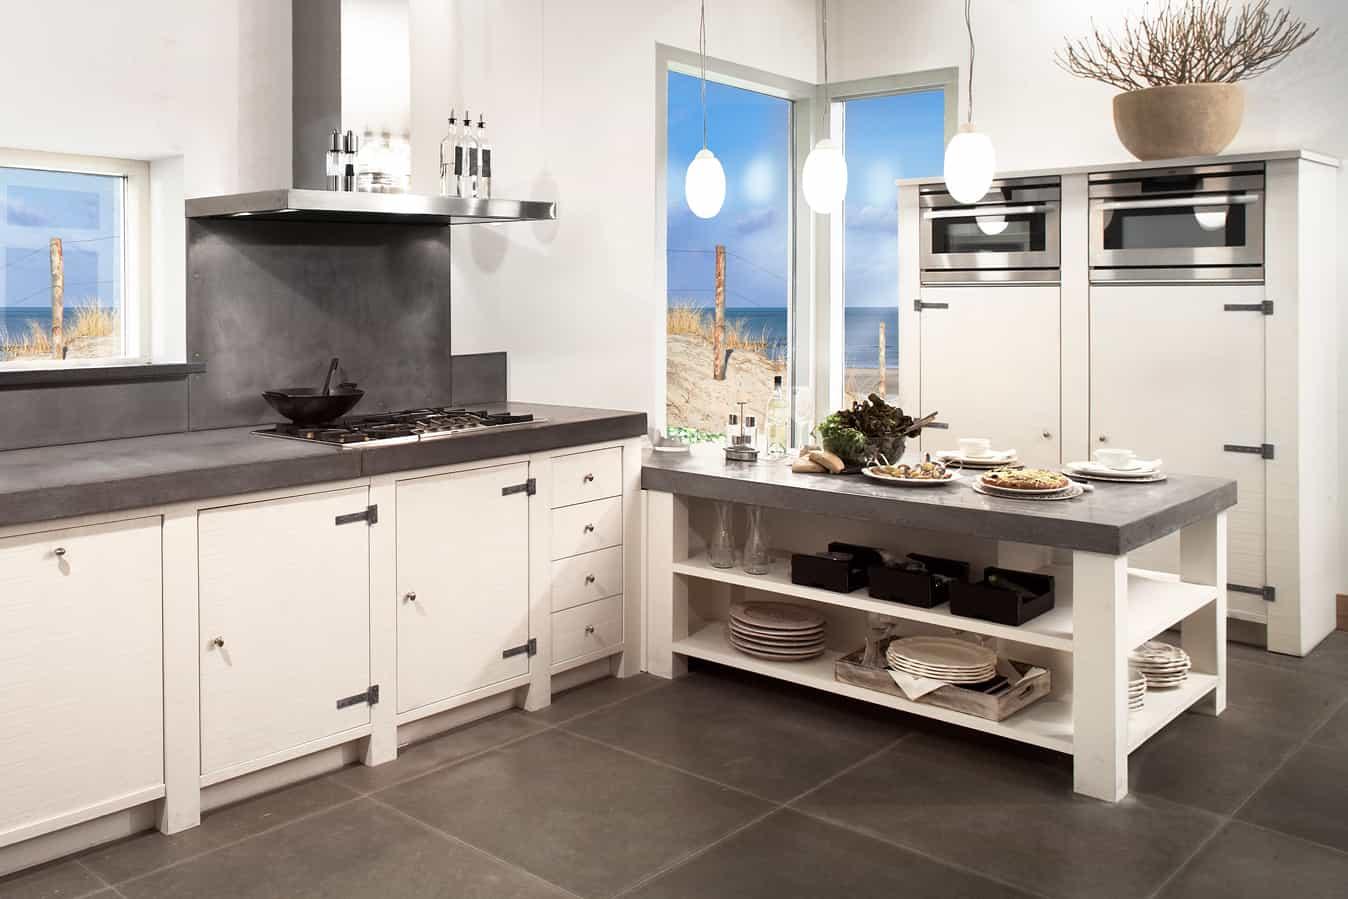 Sitte keuken betonnen blad